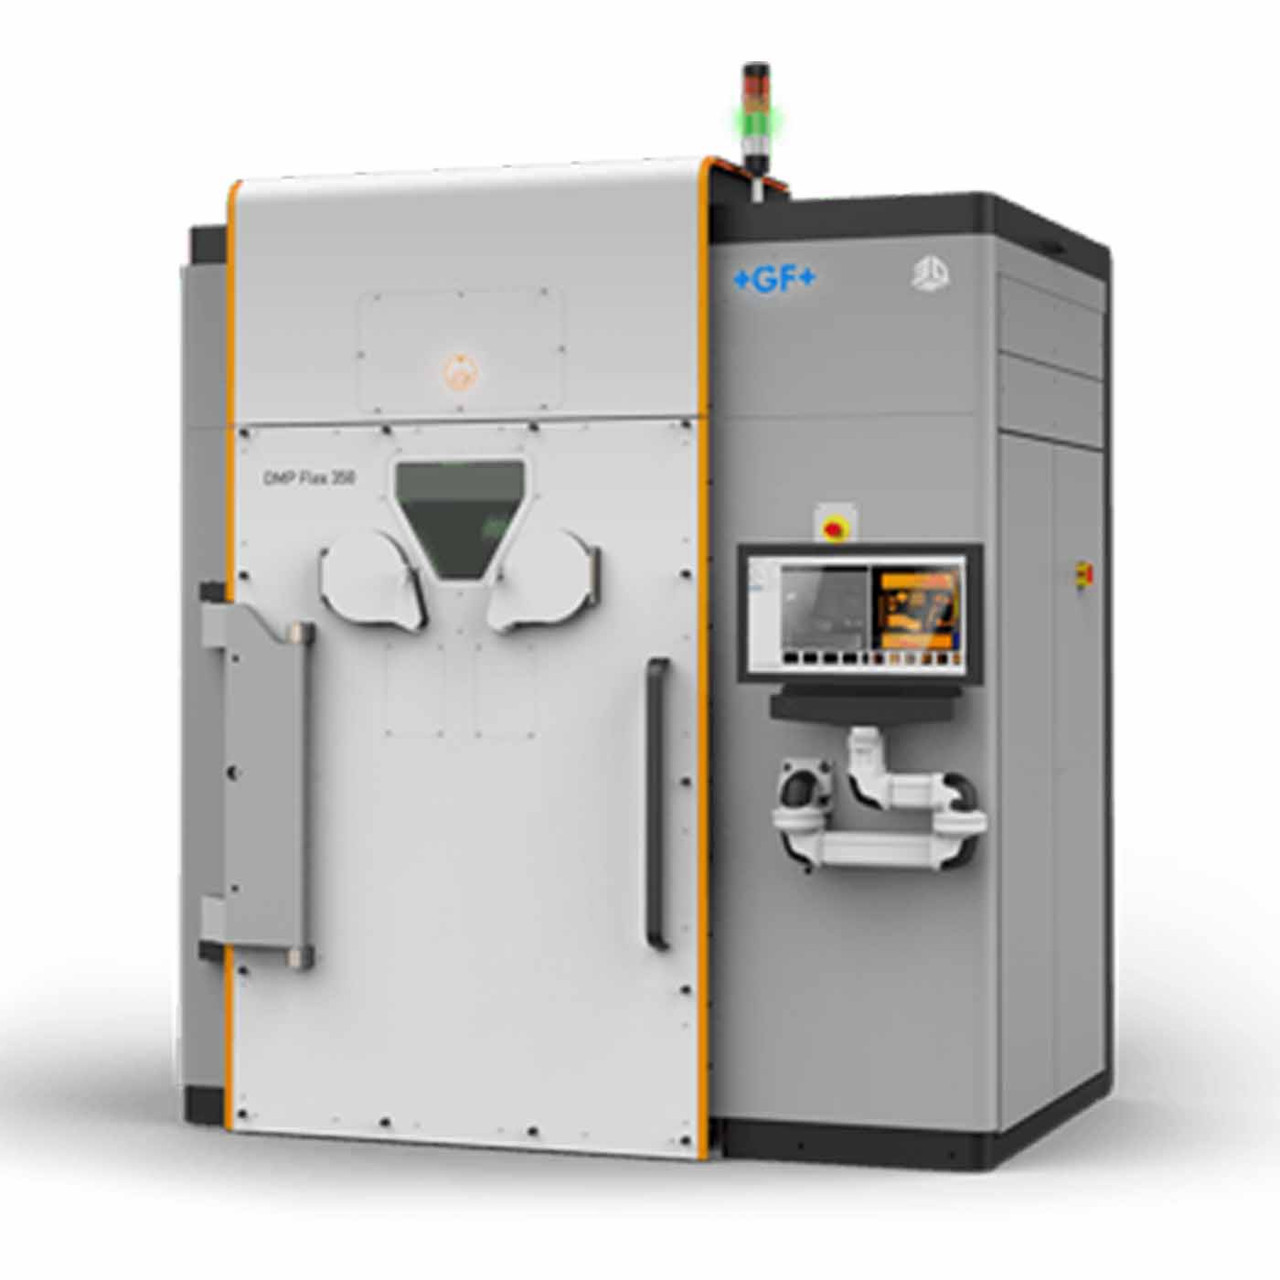 DMP Flex 350 (direct metal processing)